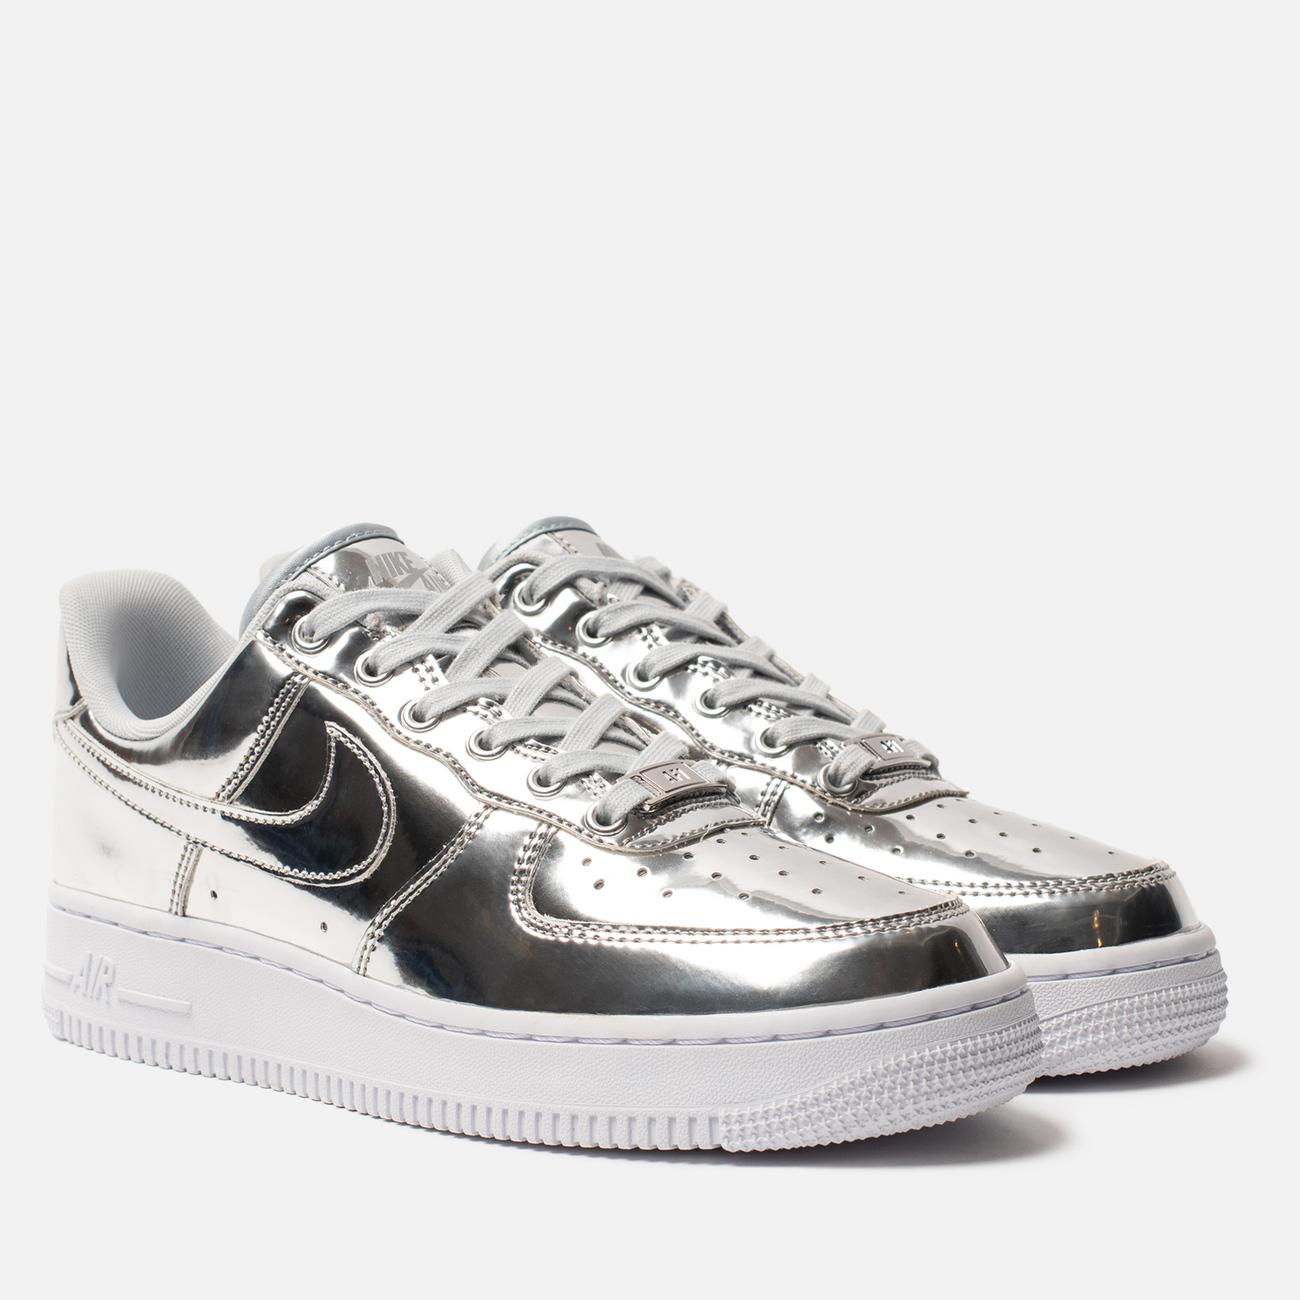 Женские кроссовки Nike Air Force 1 SP Chrome/Metallic Silver/White